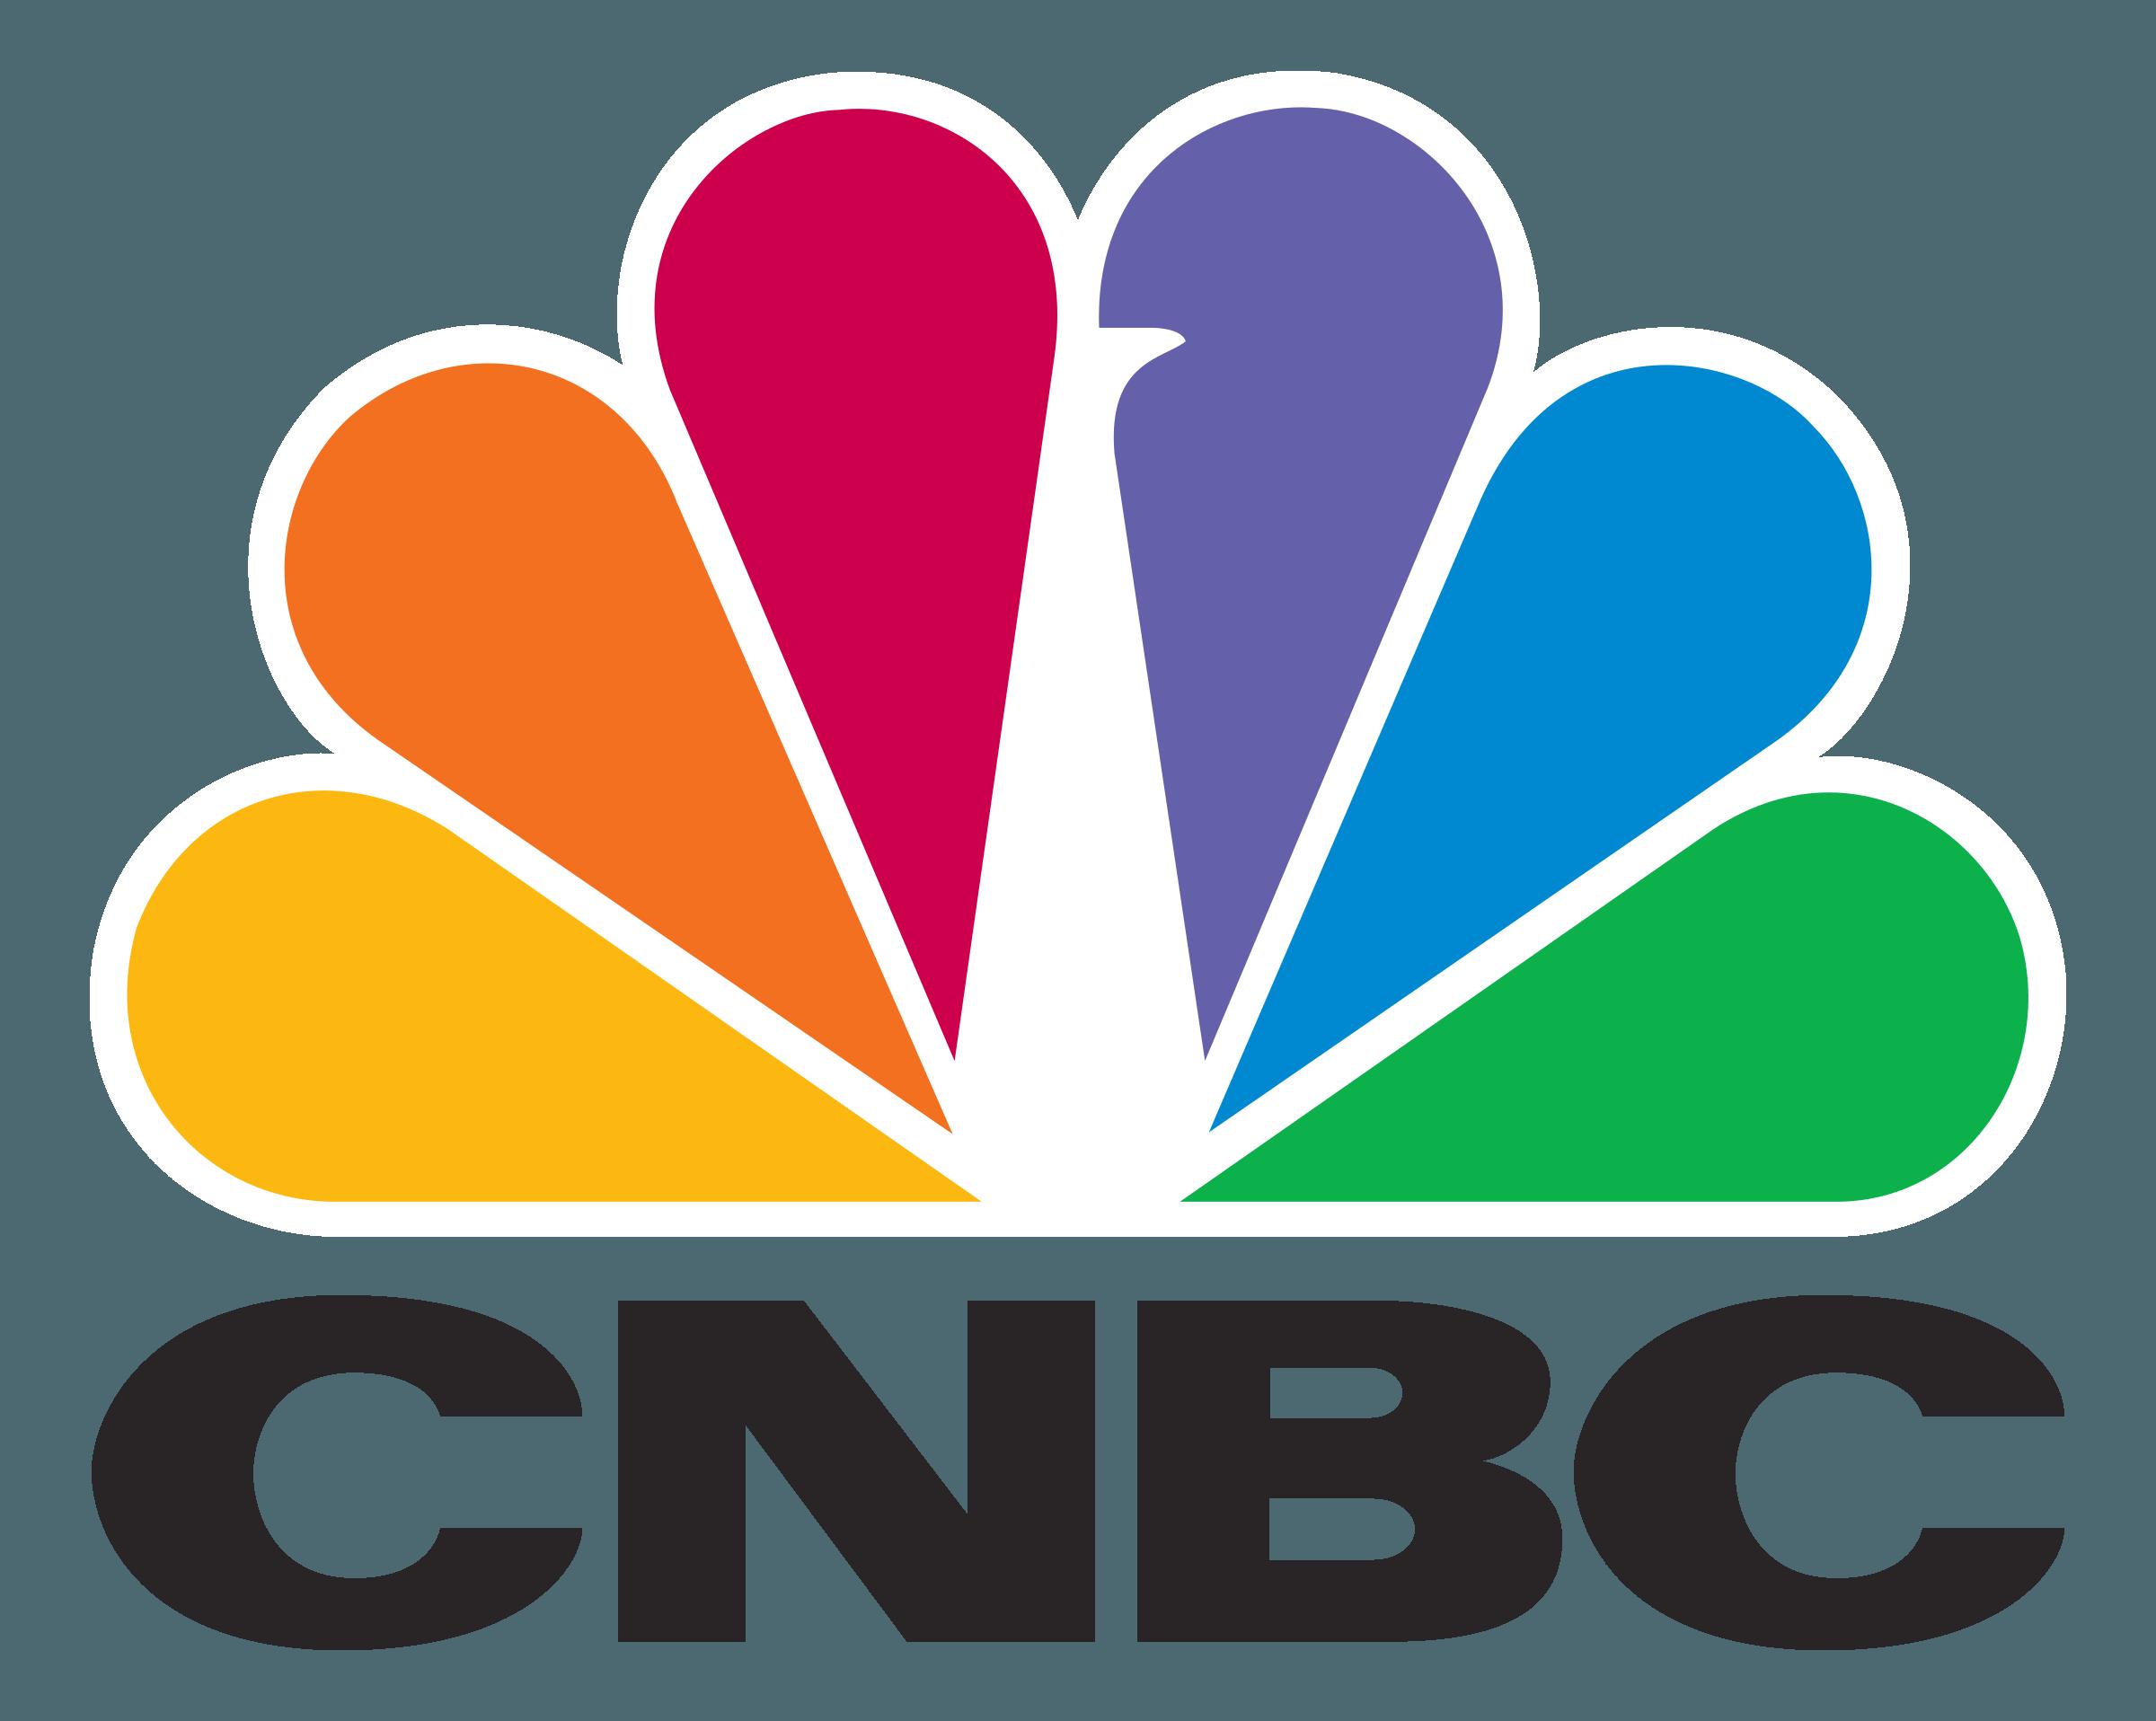 https://monzogroup.com/wp-content/uploads/2018/10/logo-1-cnbc.png